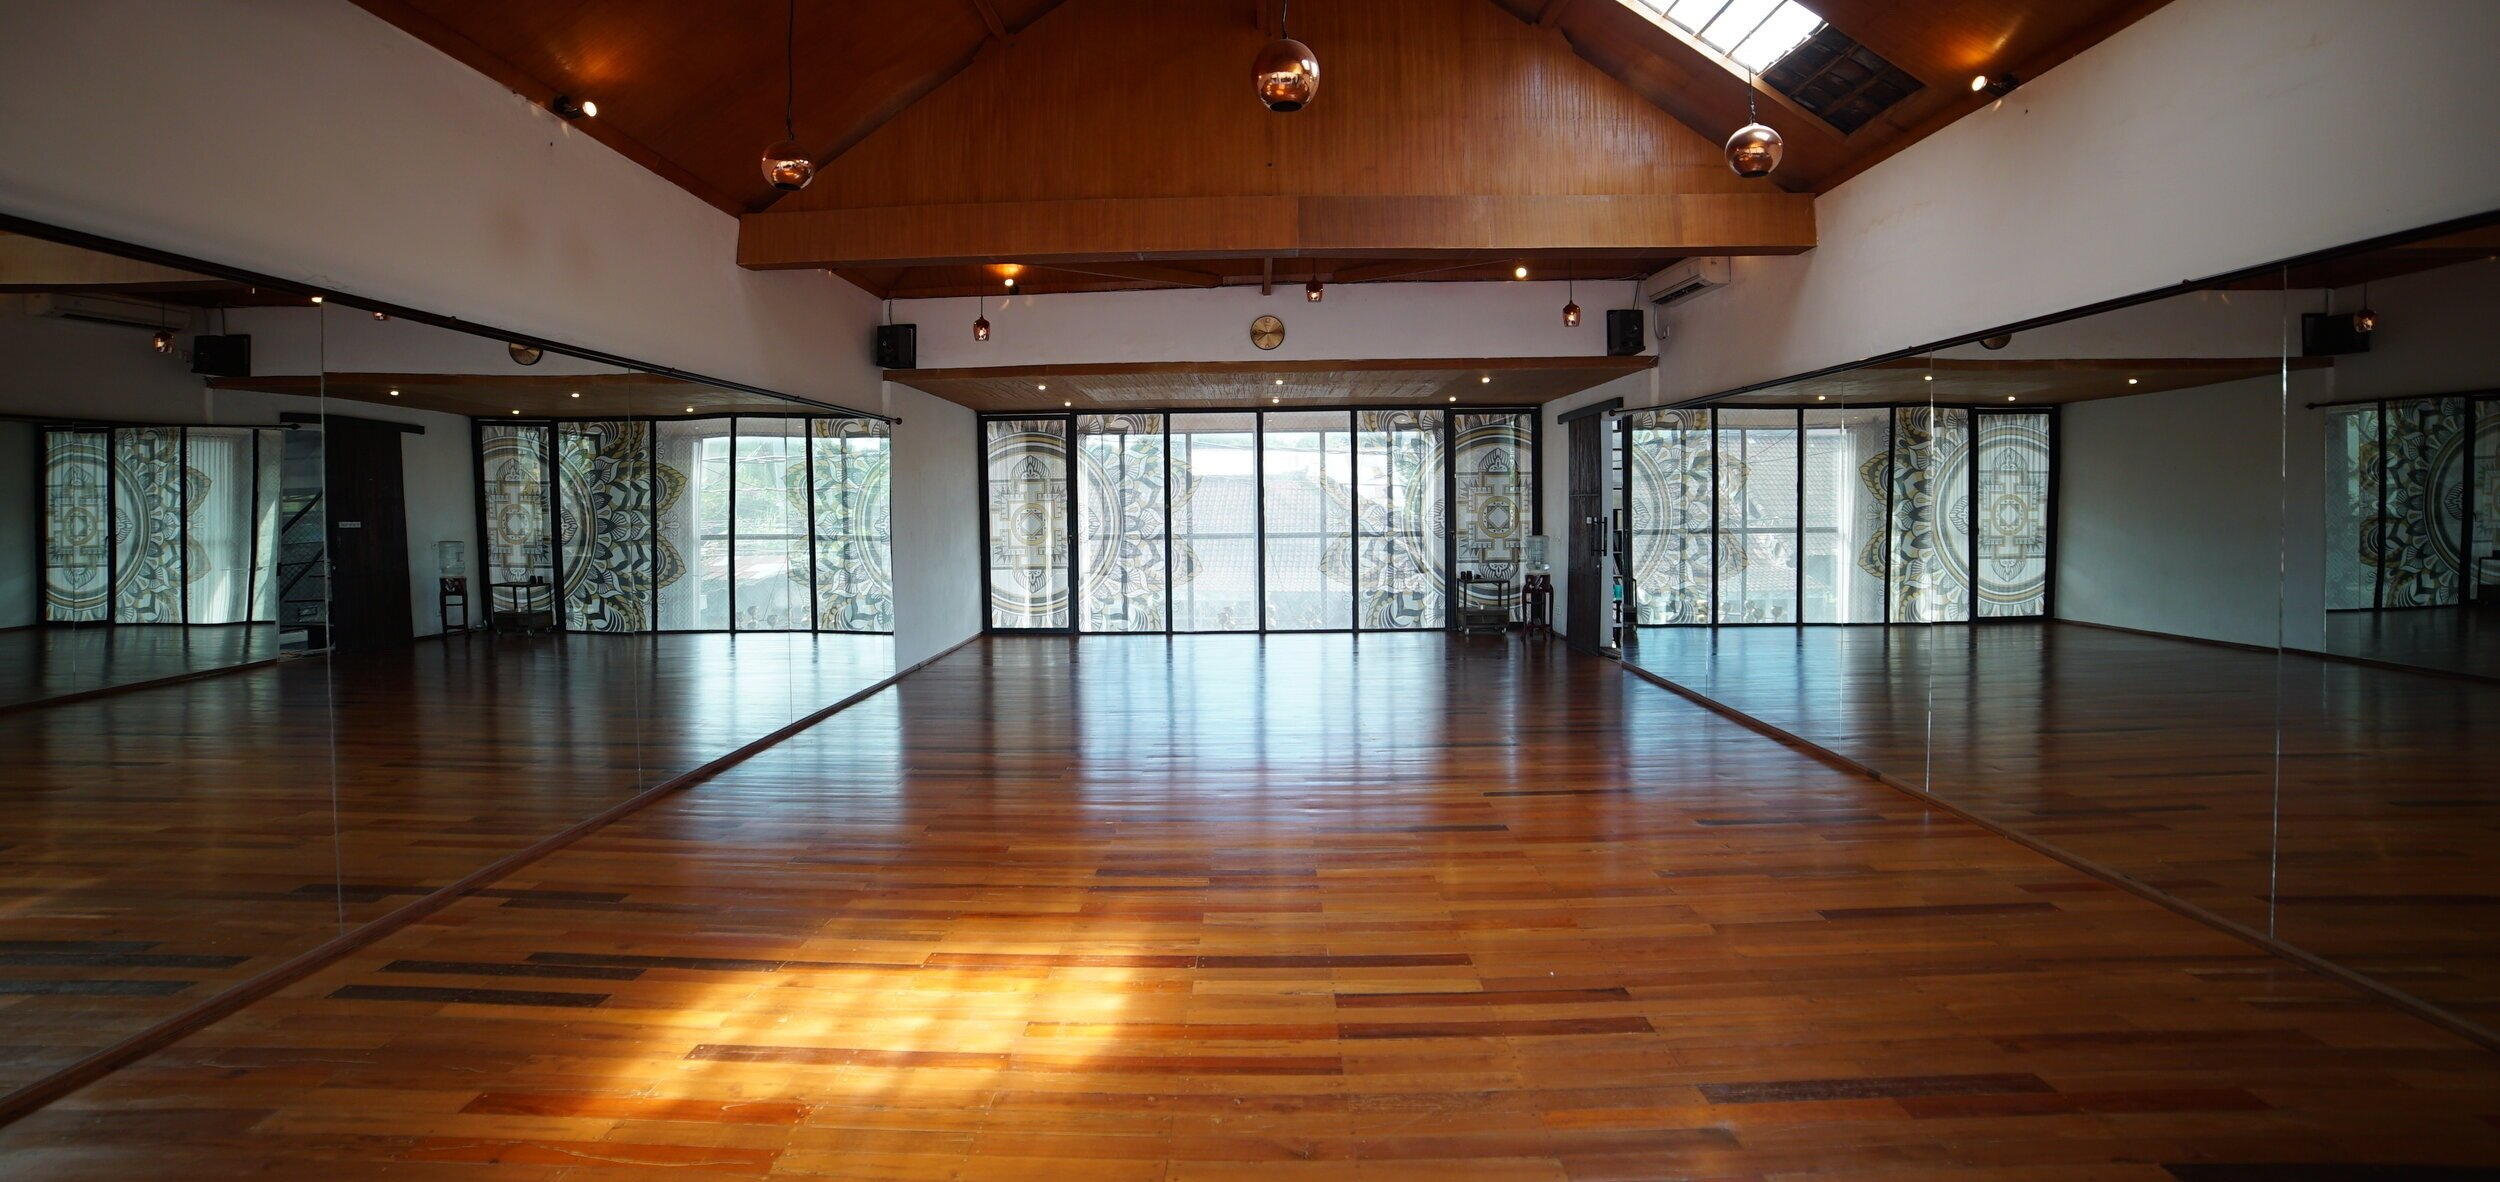 2019_05_04_Karma_House_Yoga_A7sii_35.jpg